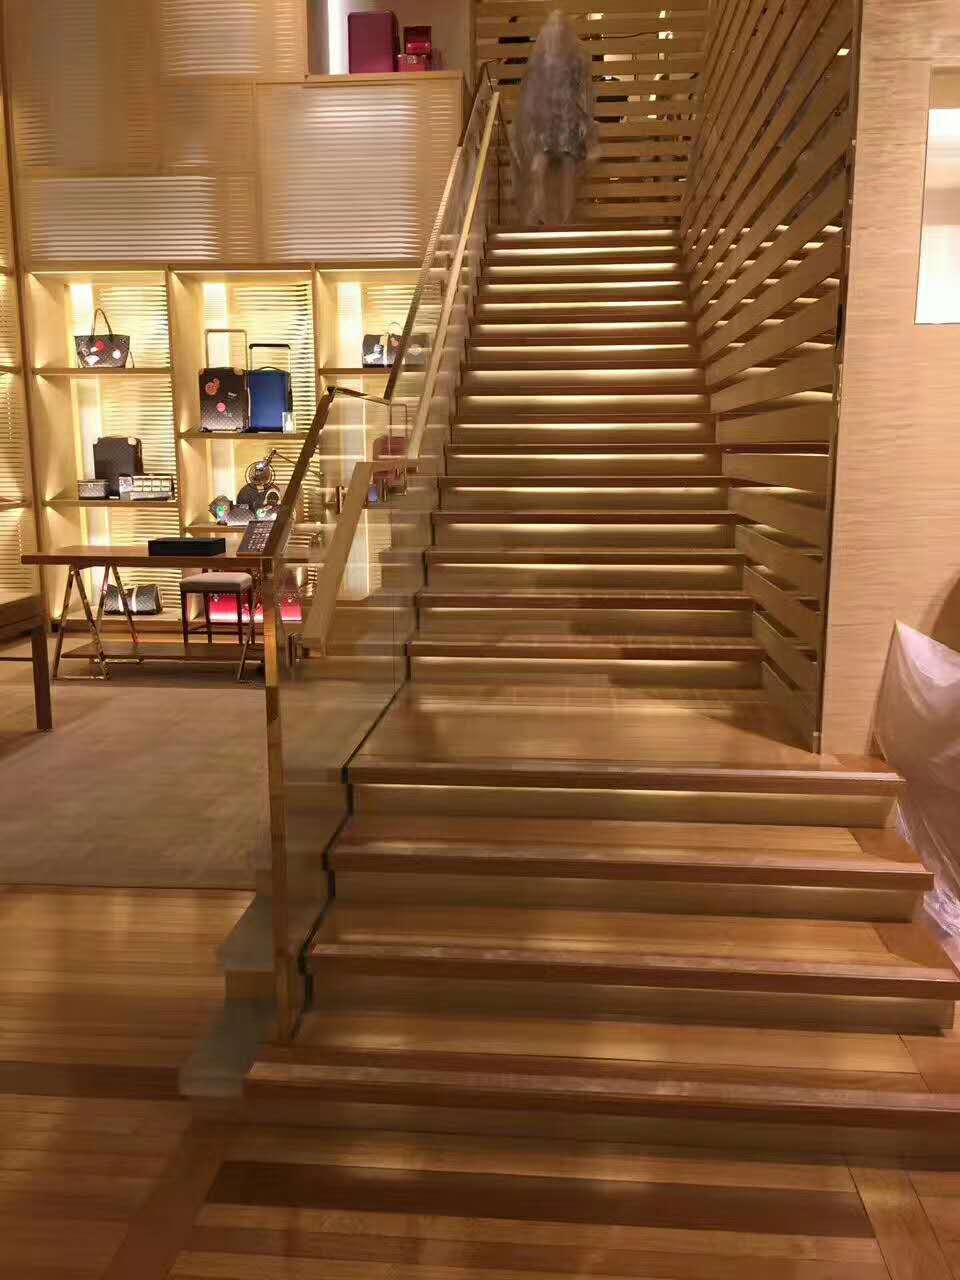 LV 店铺楼梯翻新效果